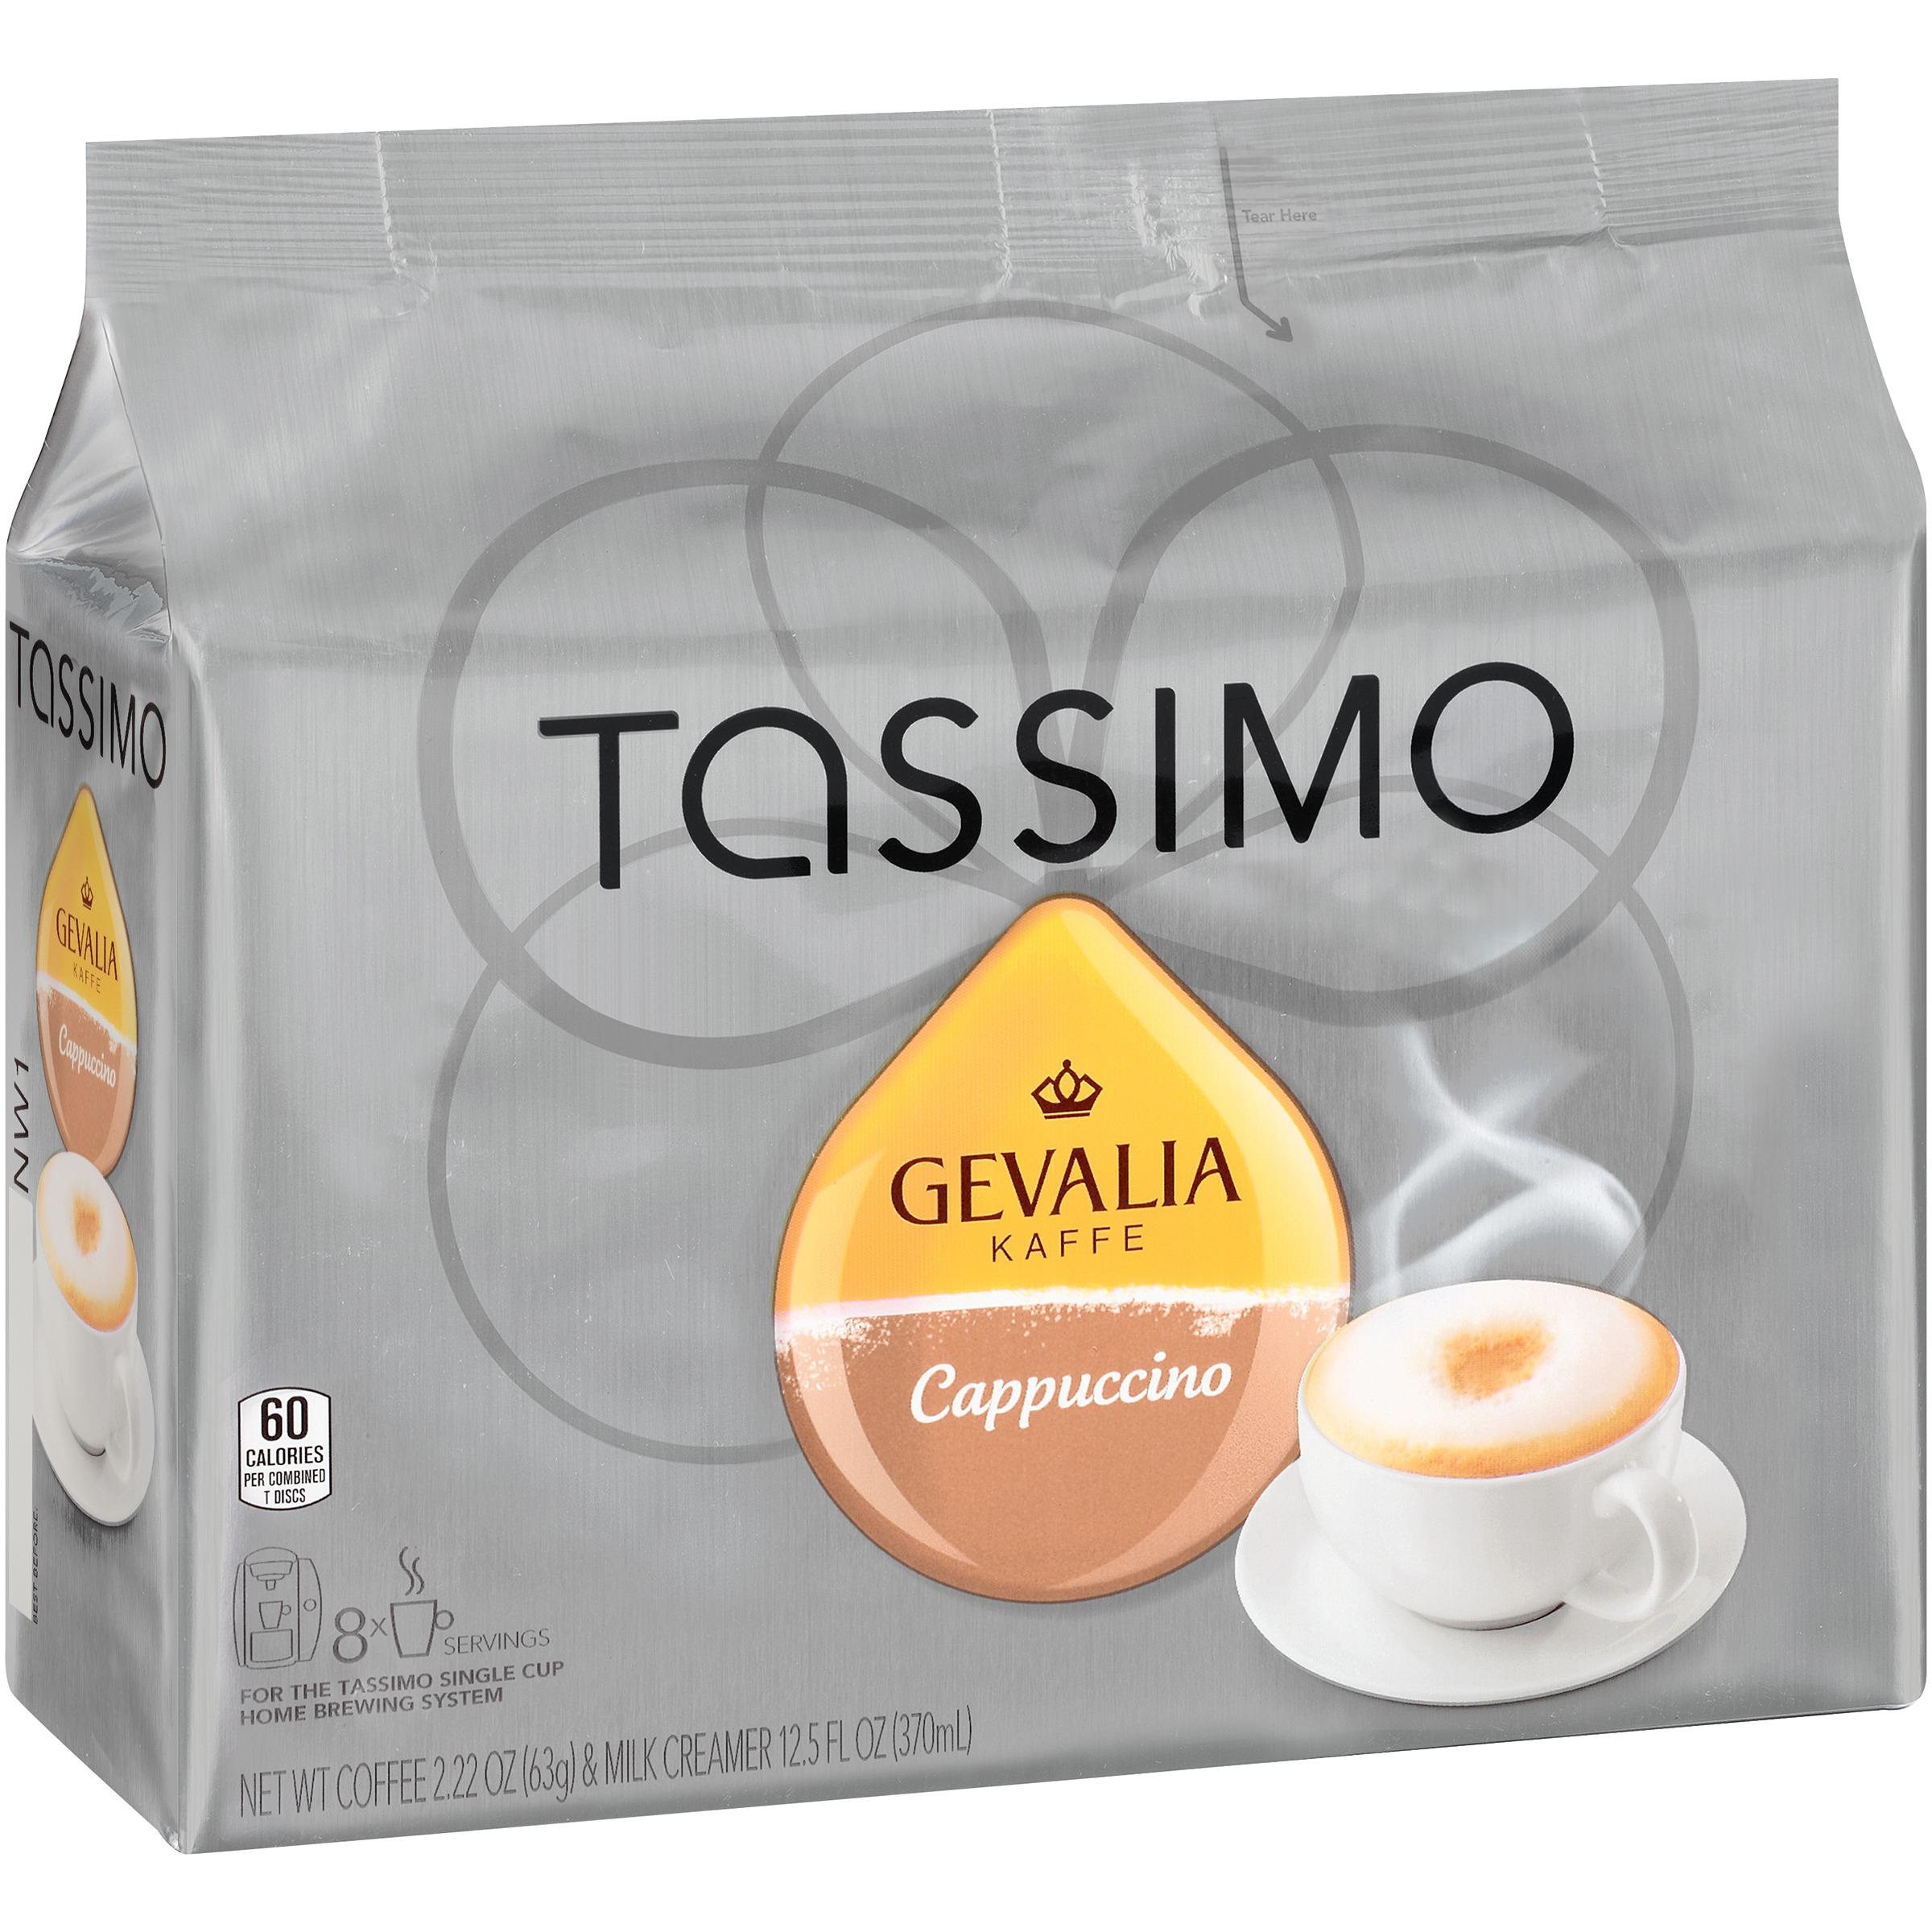 Tassimo Gevalia Cappuccino Coffee & Milk Creamer T Discs ...